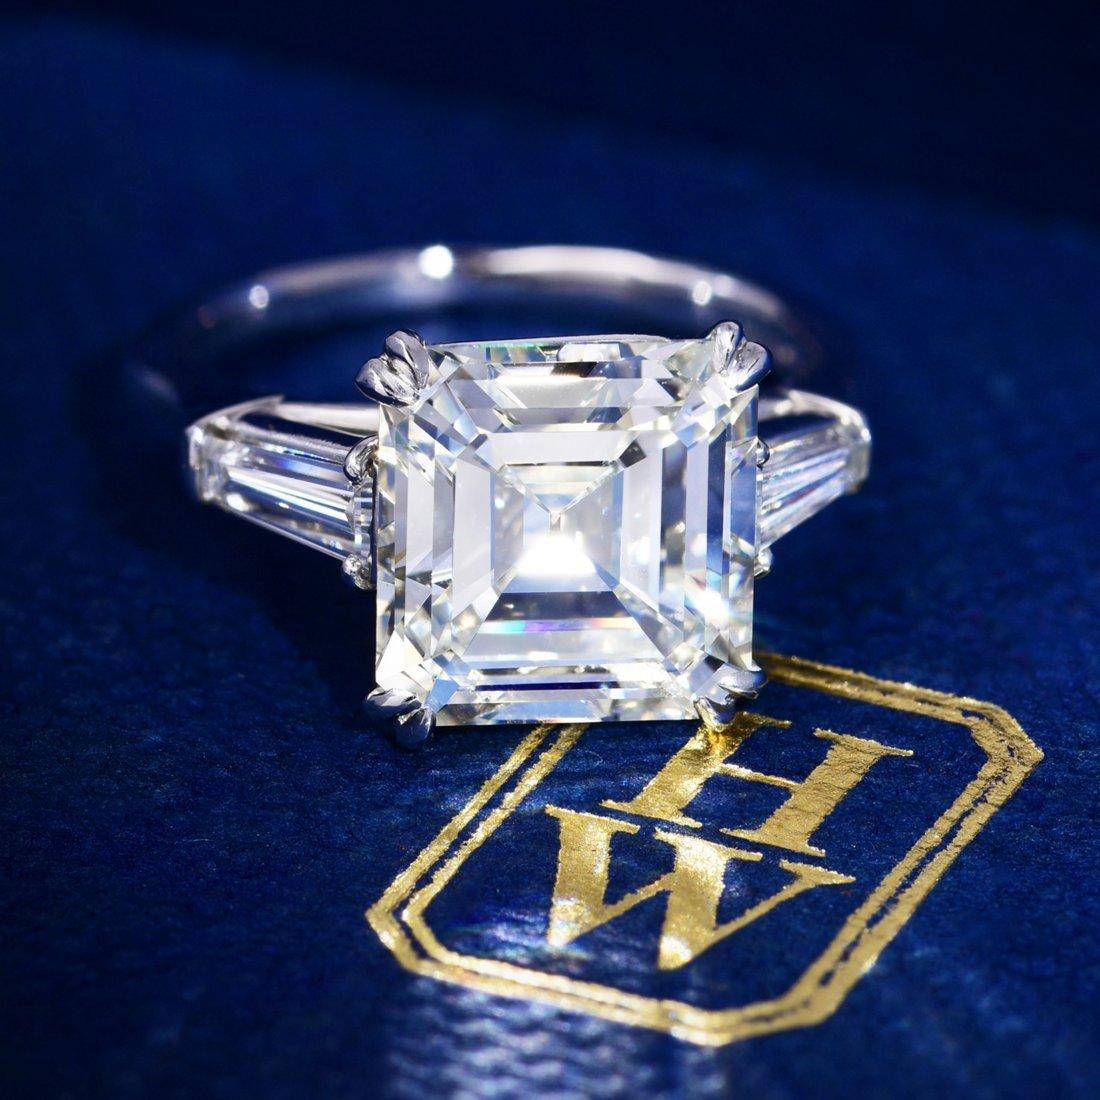 Harry Winston Vintage 3.53-Carat Asscher-Cut Diamond